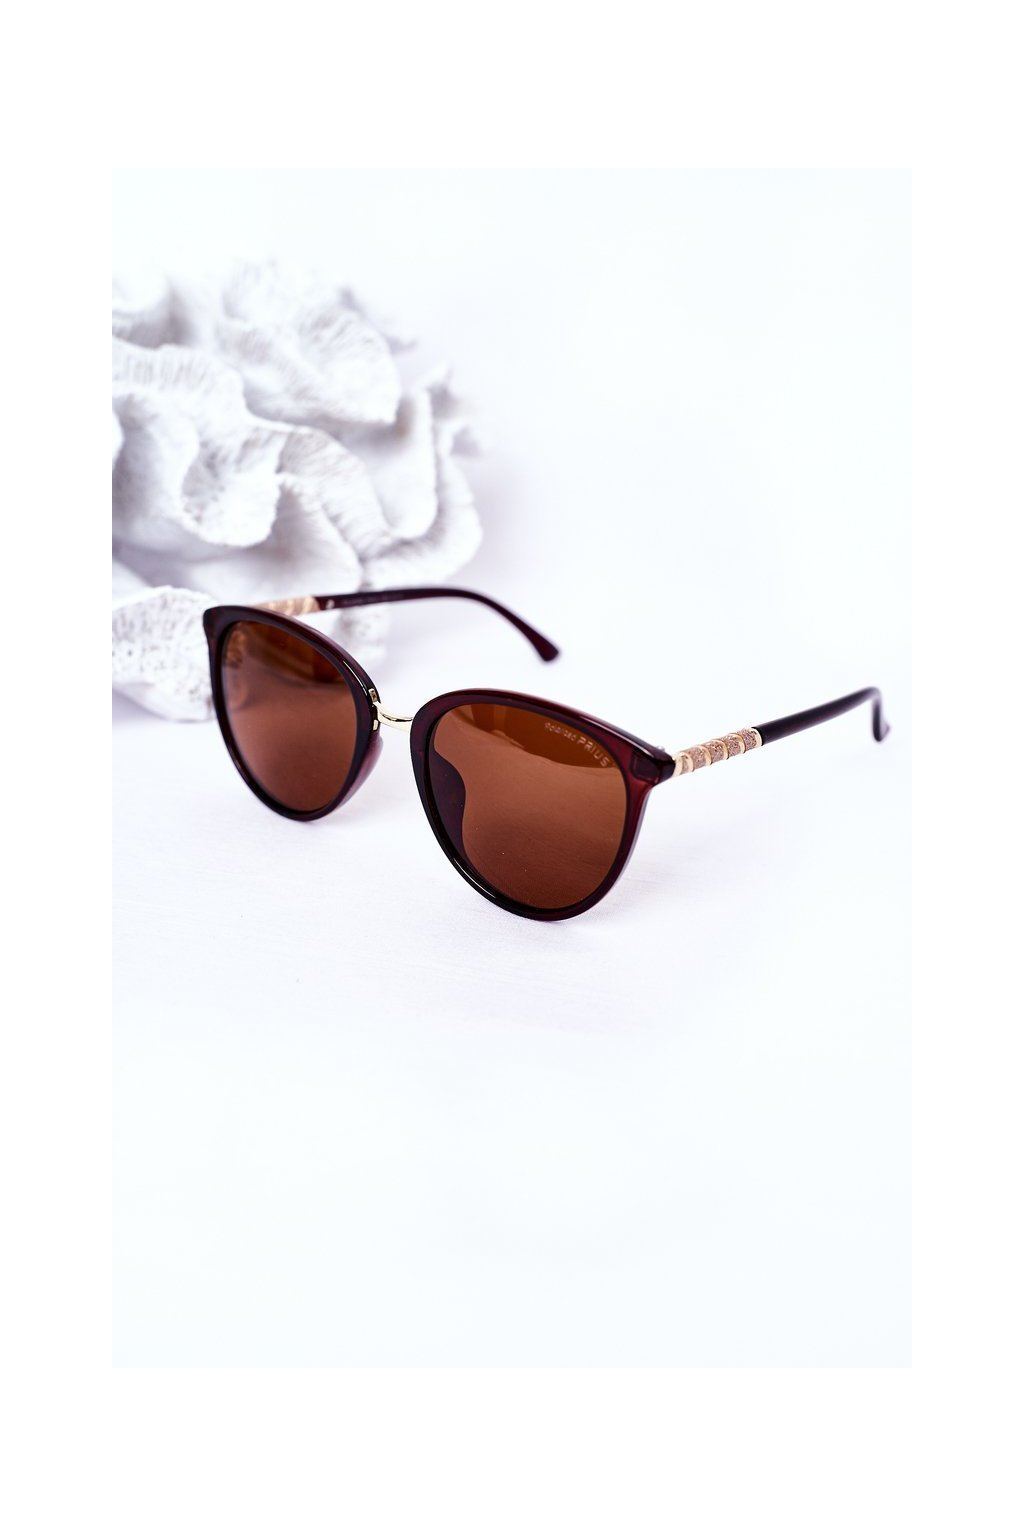 Módne slnečné okuliare hendé Polarized PRIUS PRIUS002 BROWN